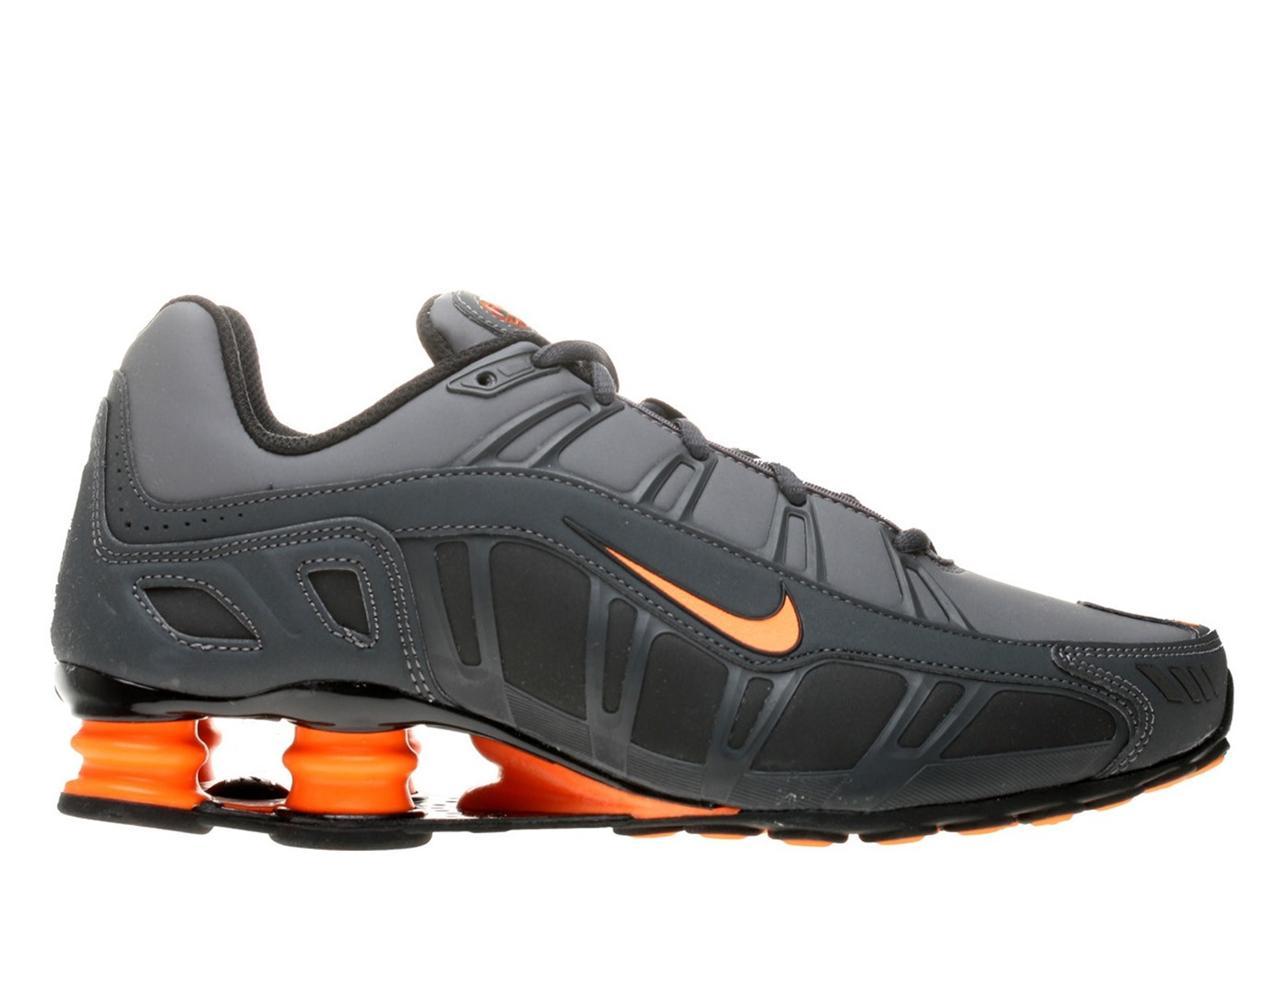 0bbf6c815463 Nike Shox Turbo Livestrong X Nike Air Max 90 Hyperfuse